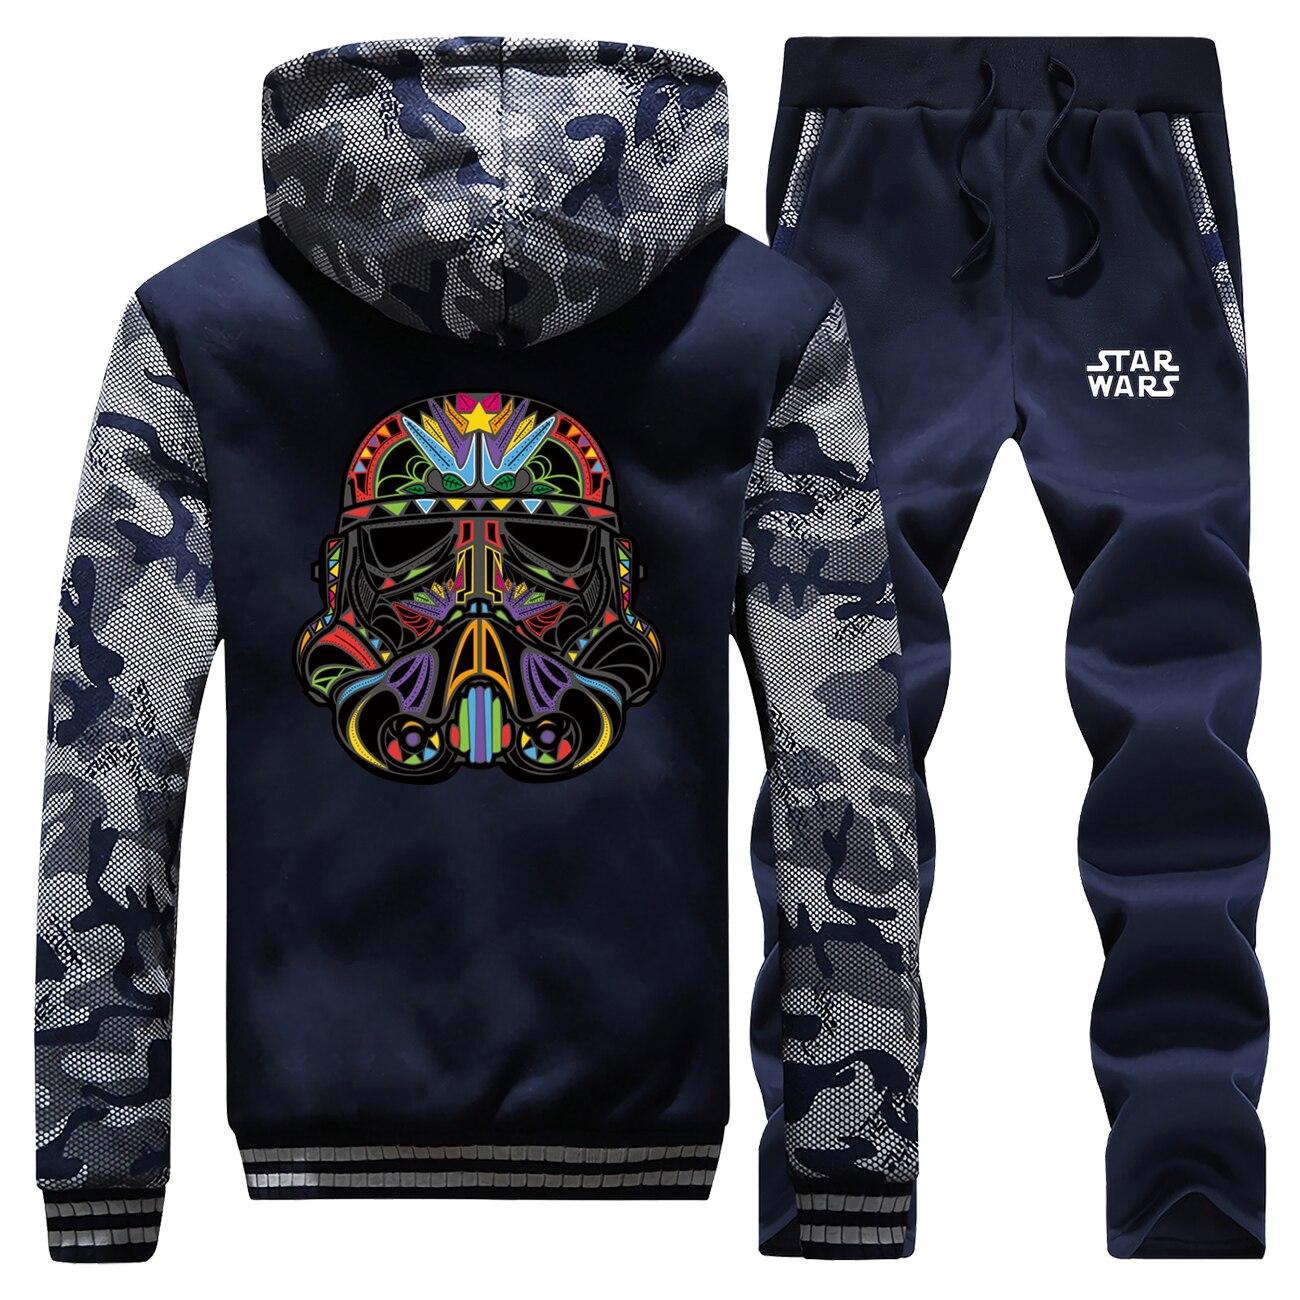 Star Wars Camo Sportswear Fashion Darth Vader Face Print Hoodies Pant Sets Men Fleece Sweatshirt Hip Hop Harajuku Streetwear